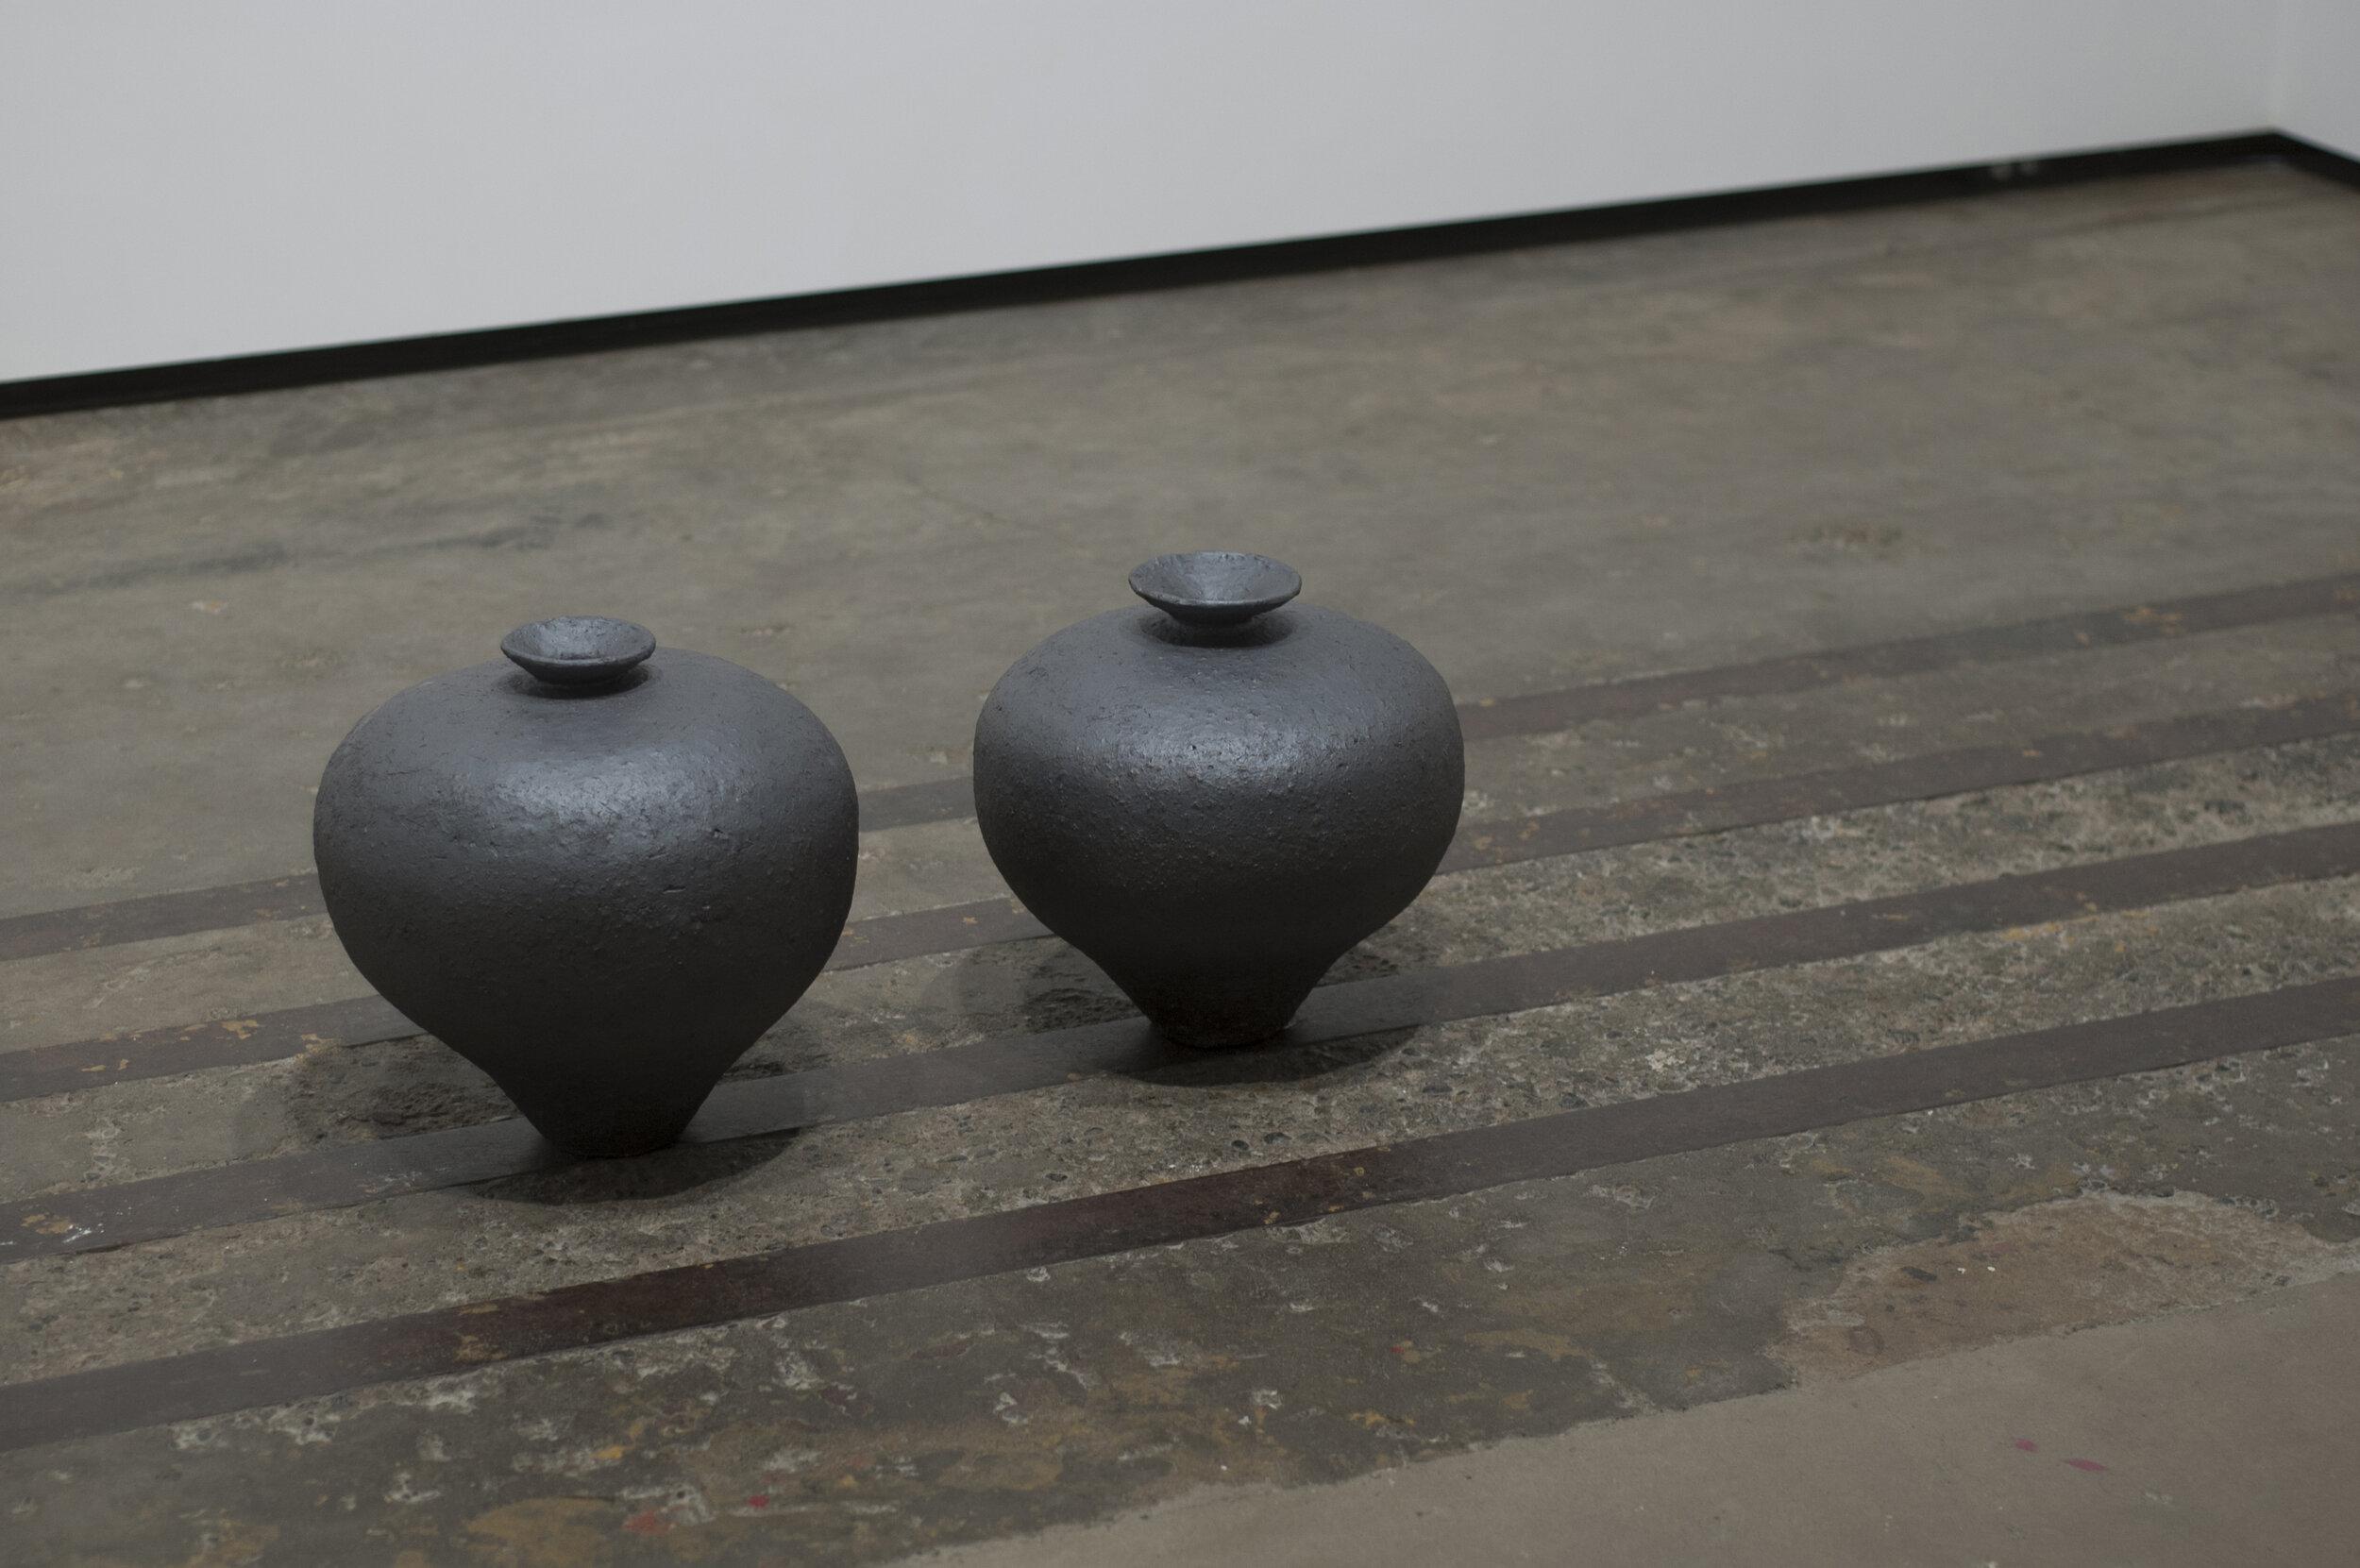 Michael Edward Miller  Fracture , 2016, hand-coiled reduction fired storage jars, granite feldspar, black smokey quartz crystal